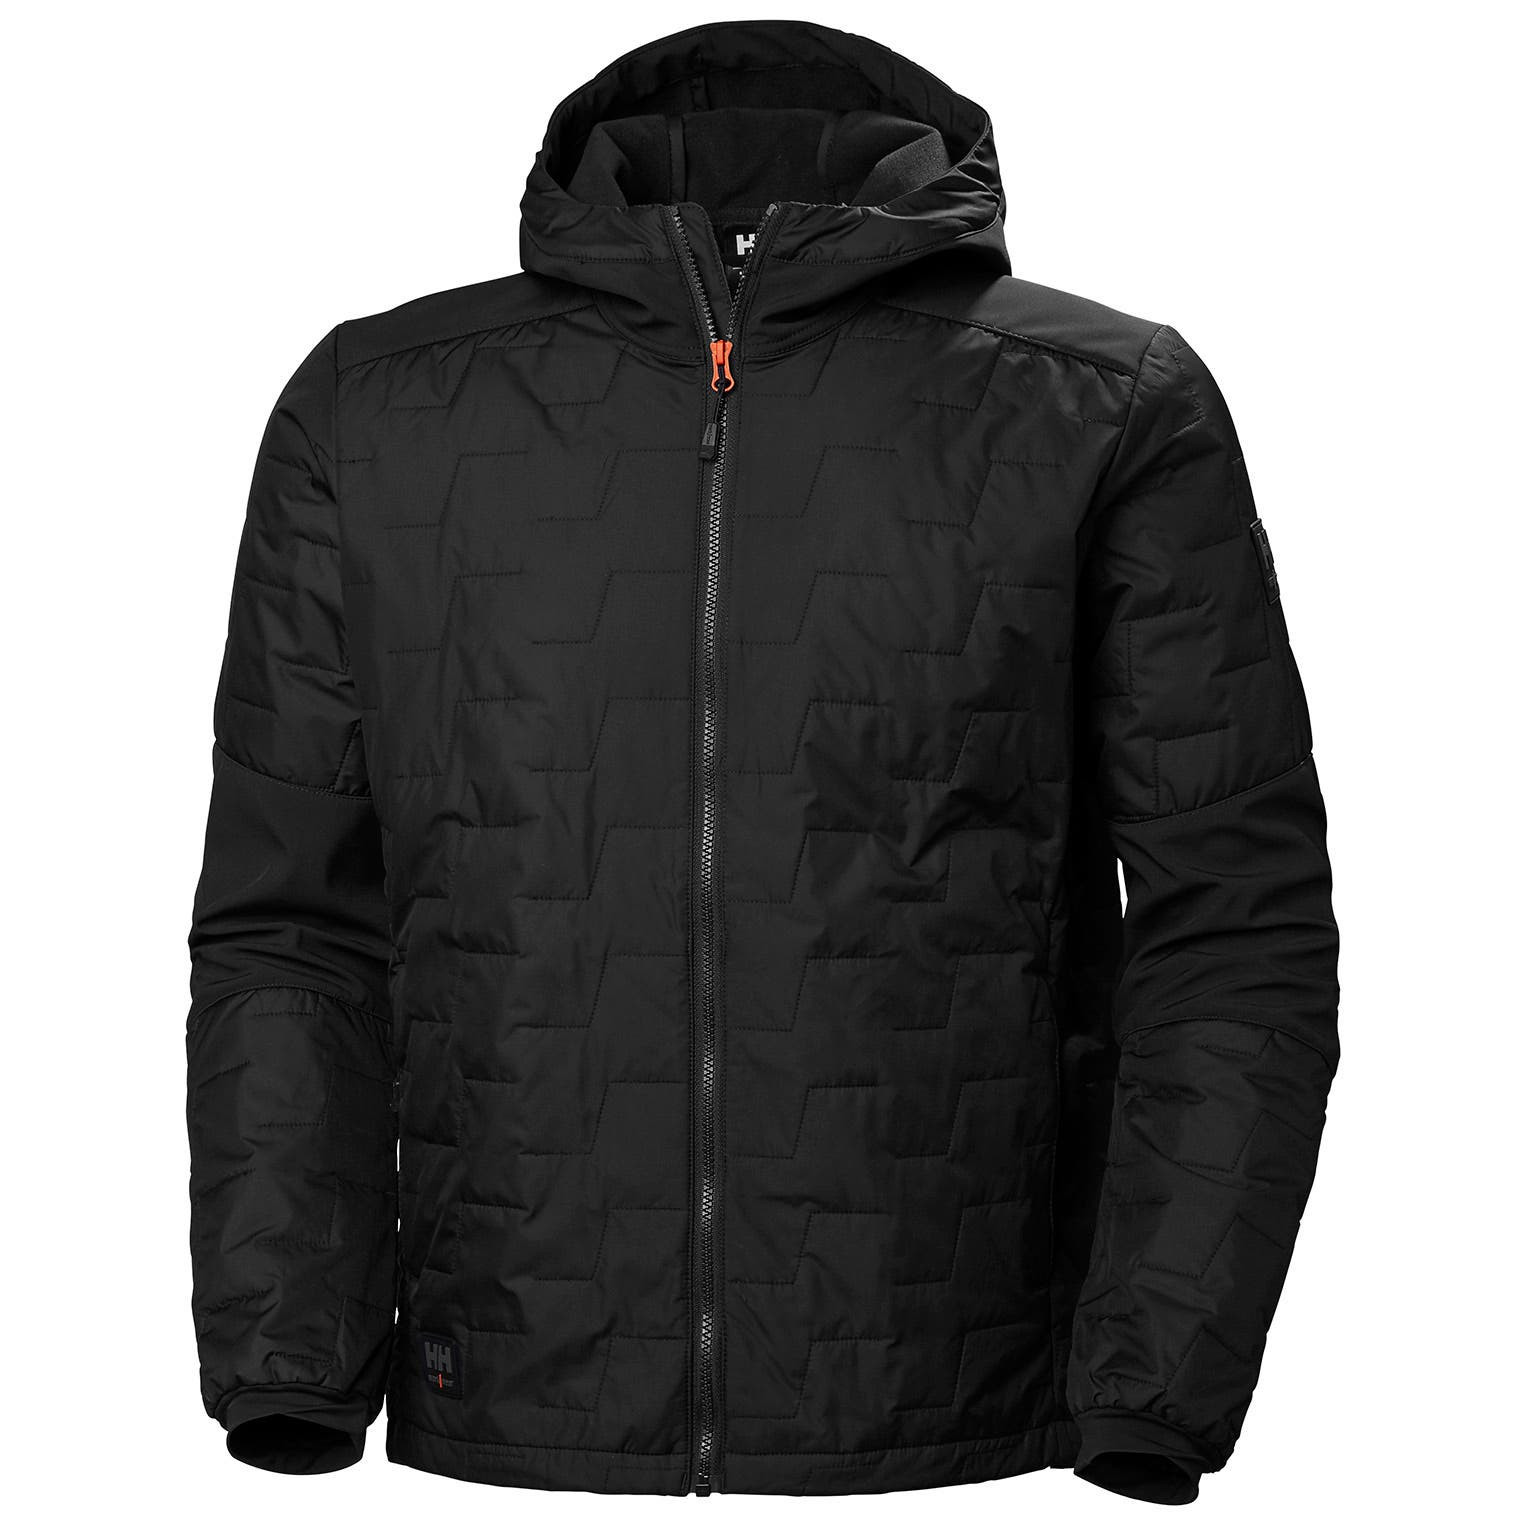 Куртка Helly Hansen Kensington Hooded Lifaloft Jacket - 73230 (Black; M)